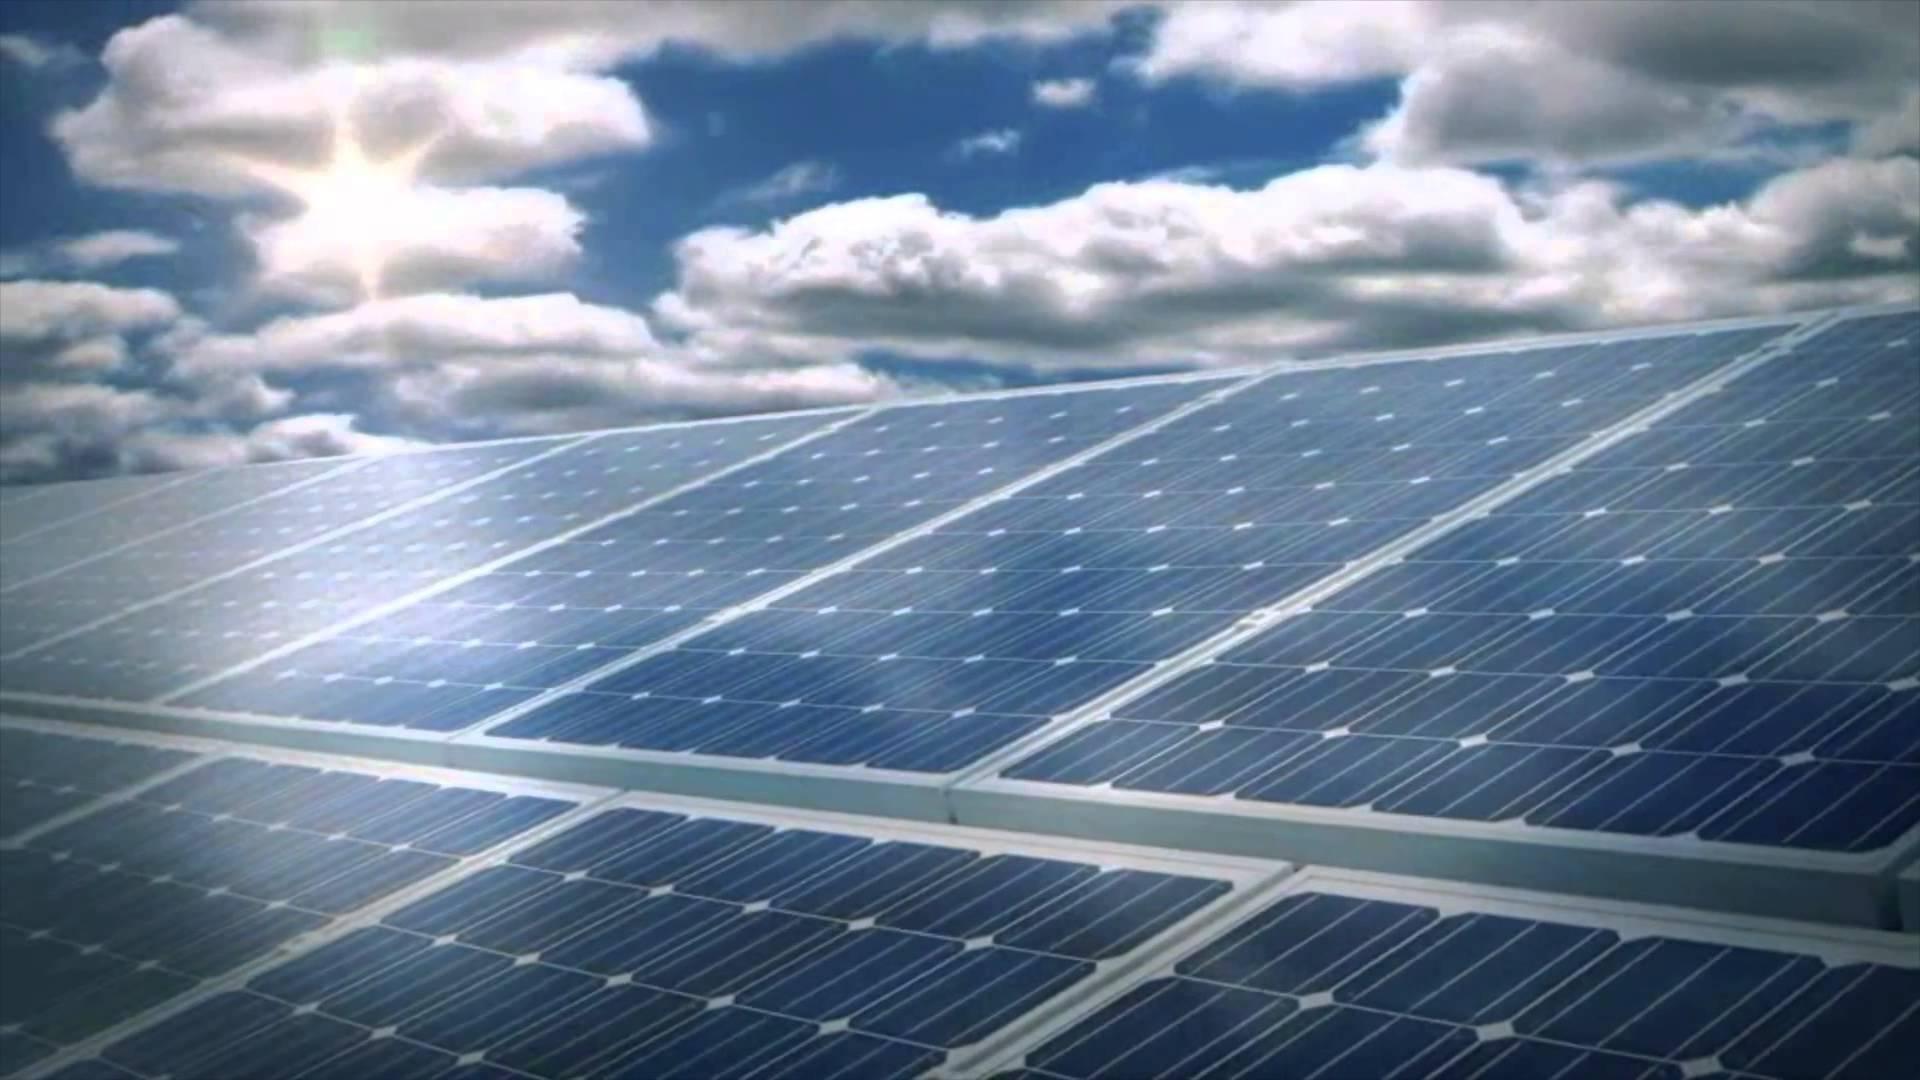 Epia european photovoltaic industry association 2018 FIFA World Cup - Wikipedia